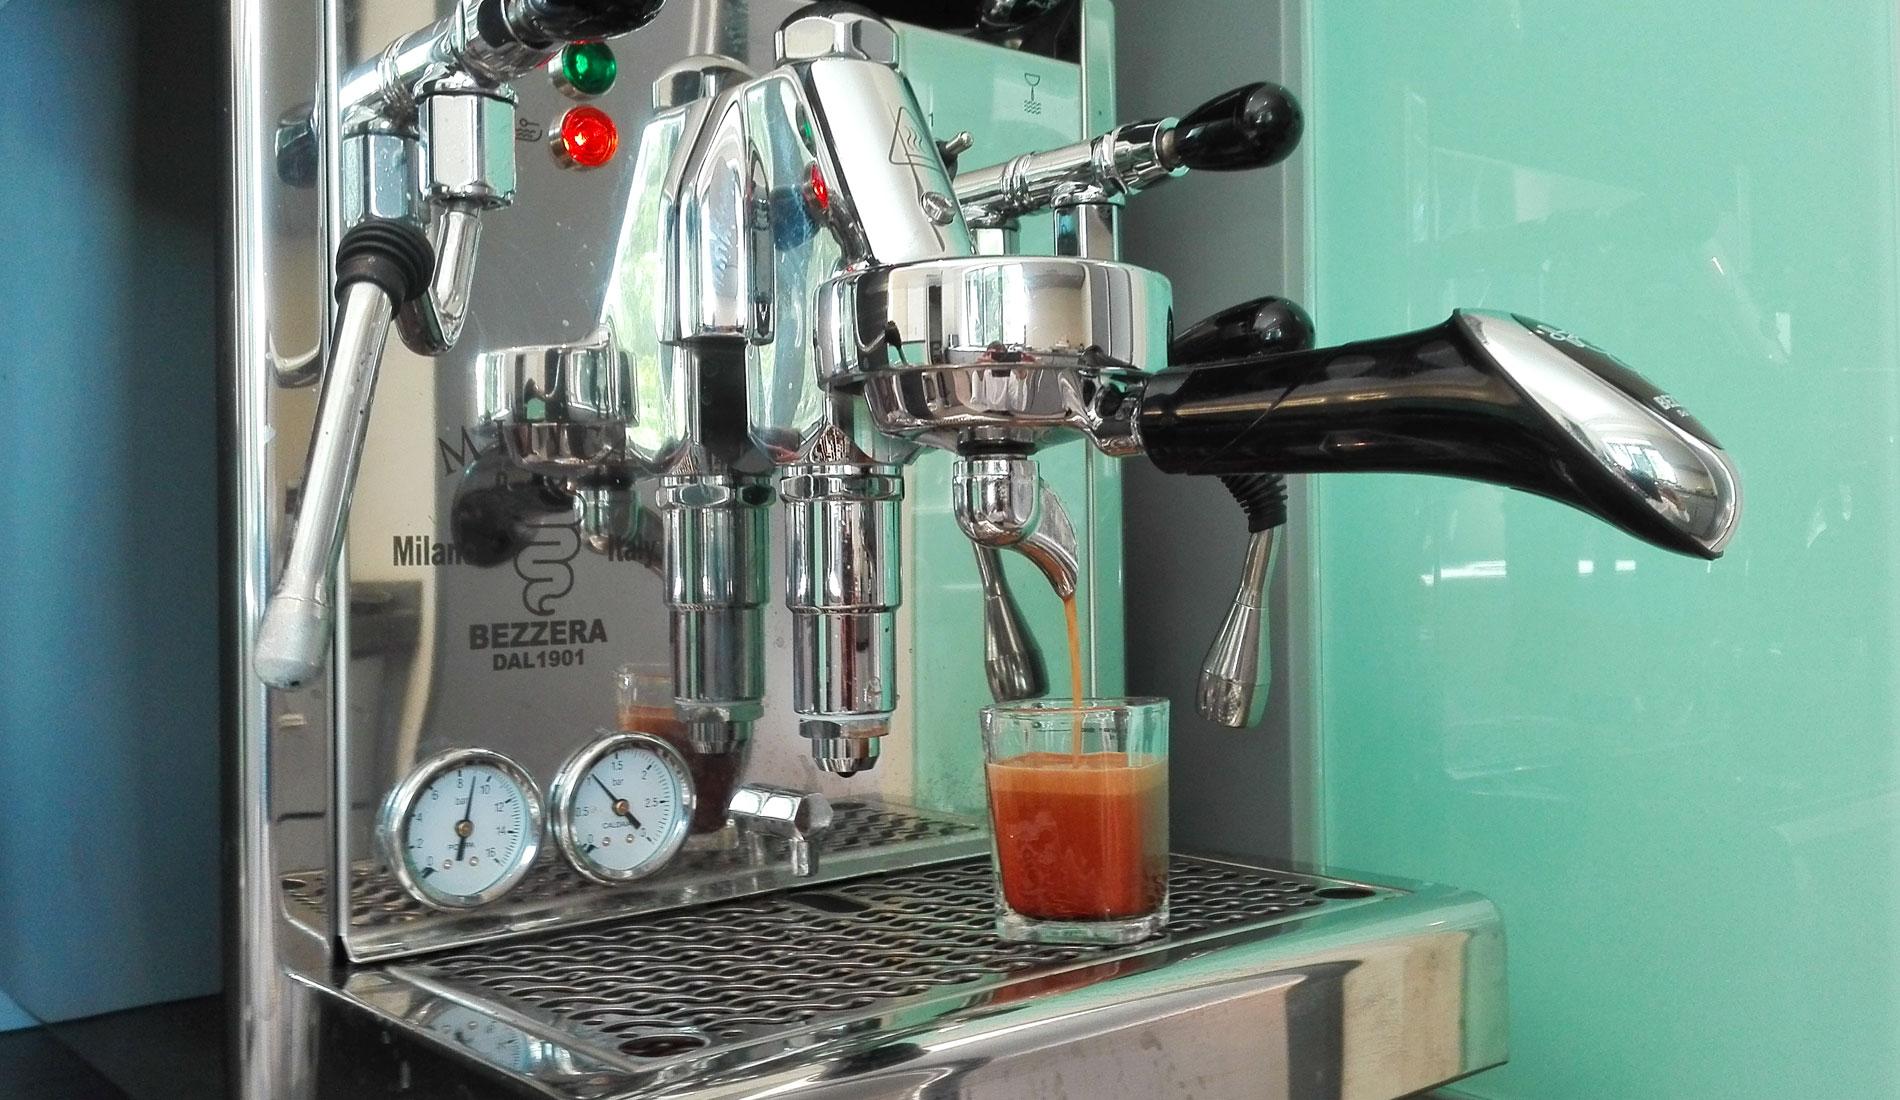 Kaffeepräsenz, Koenigs Rütter Architekten